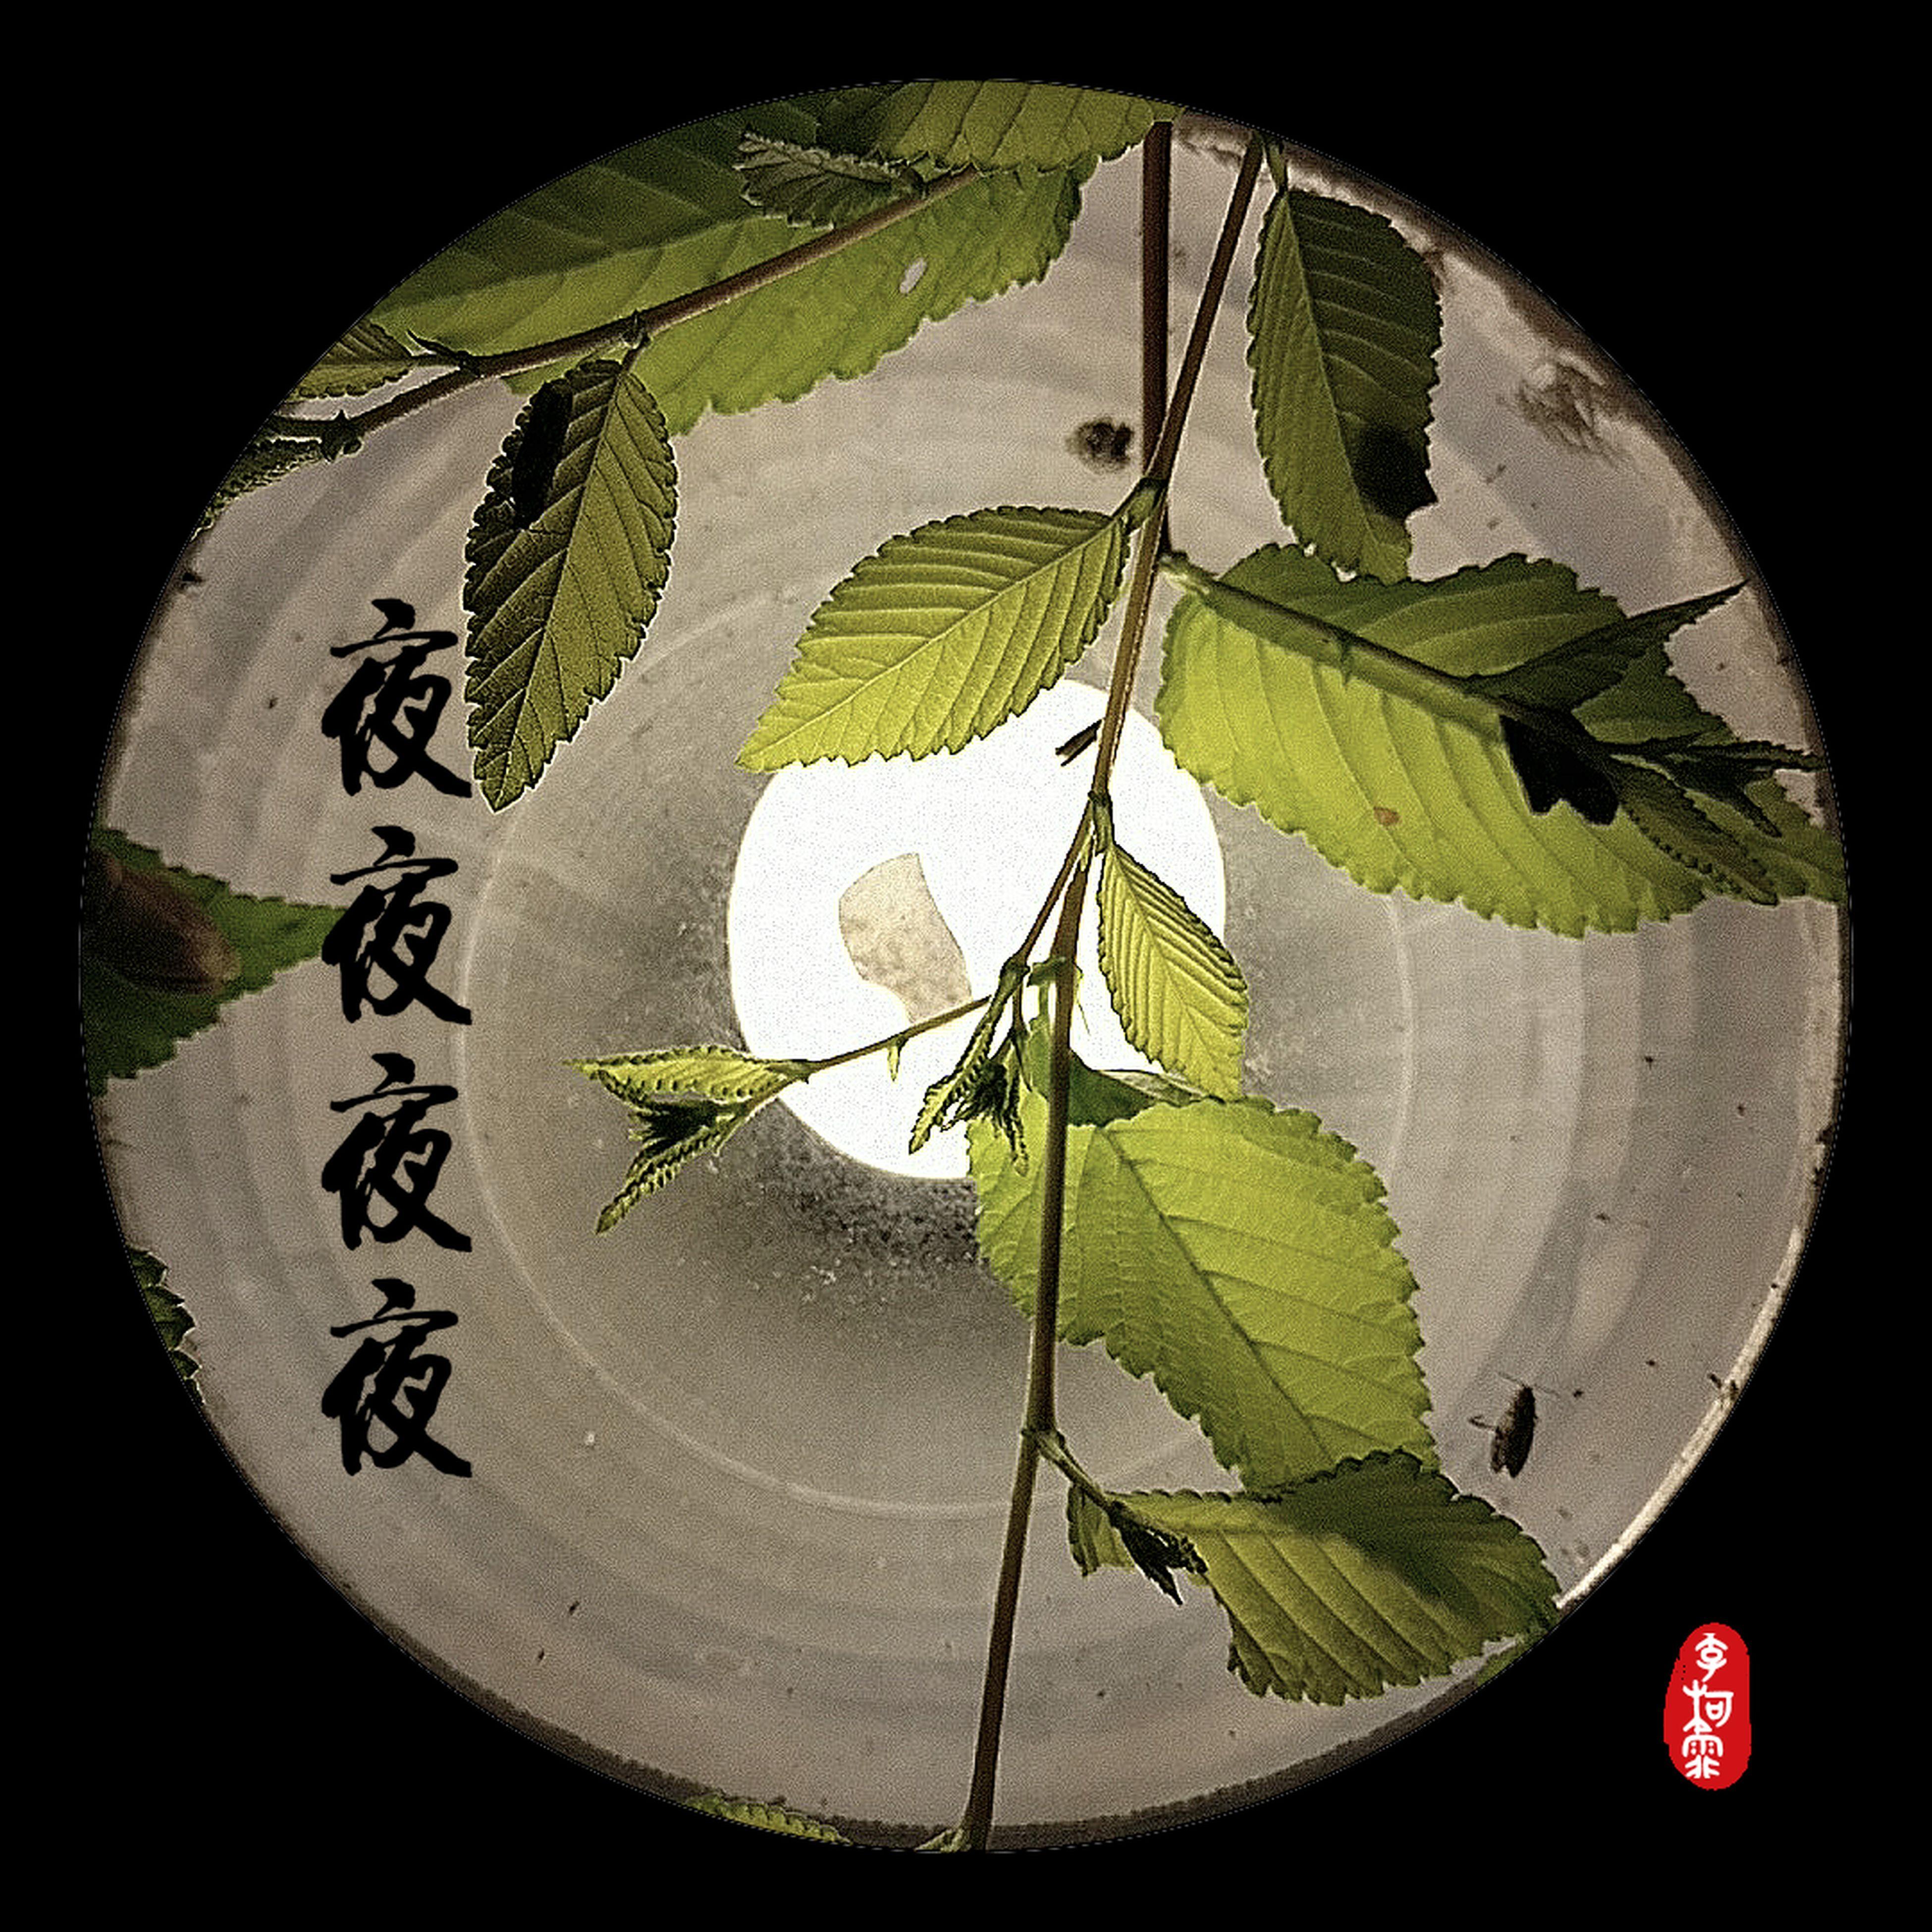 leaf, green color, plant, close-up, black background, green tea, no people, studio shot, indoors, nature, freshness, day